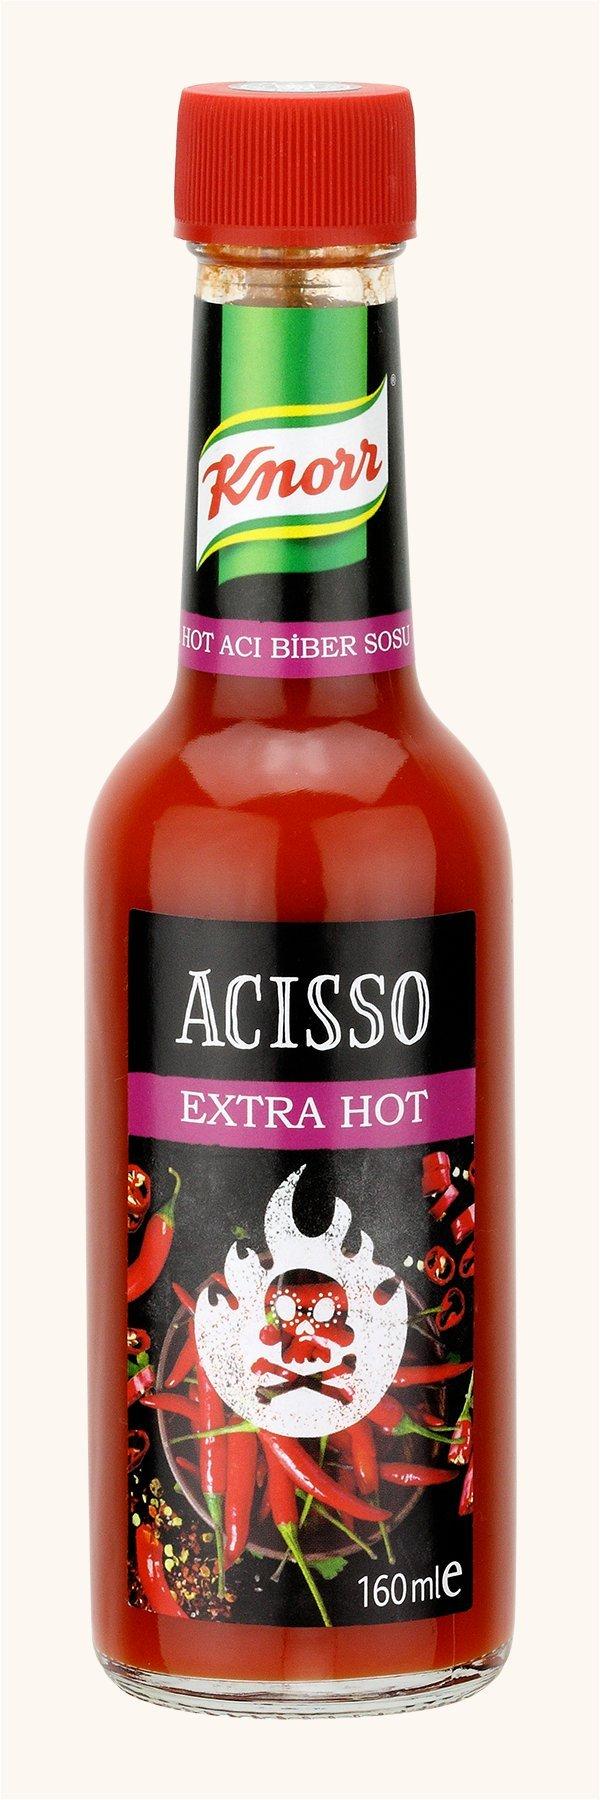 Knorr Acısso Extra Hot Acı Biber Sosu